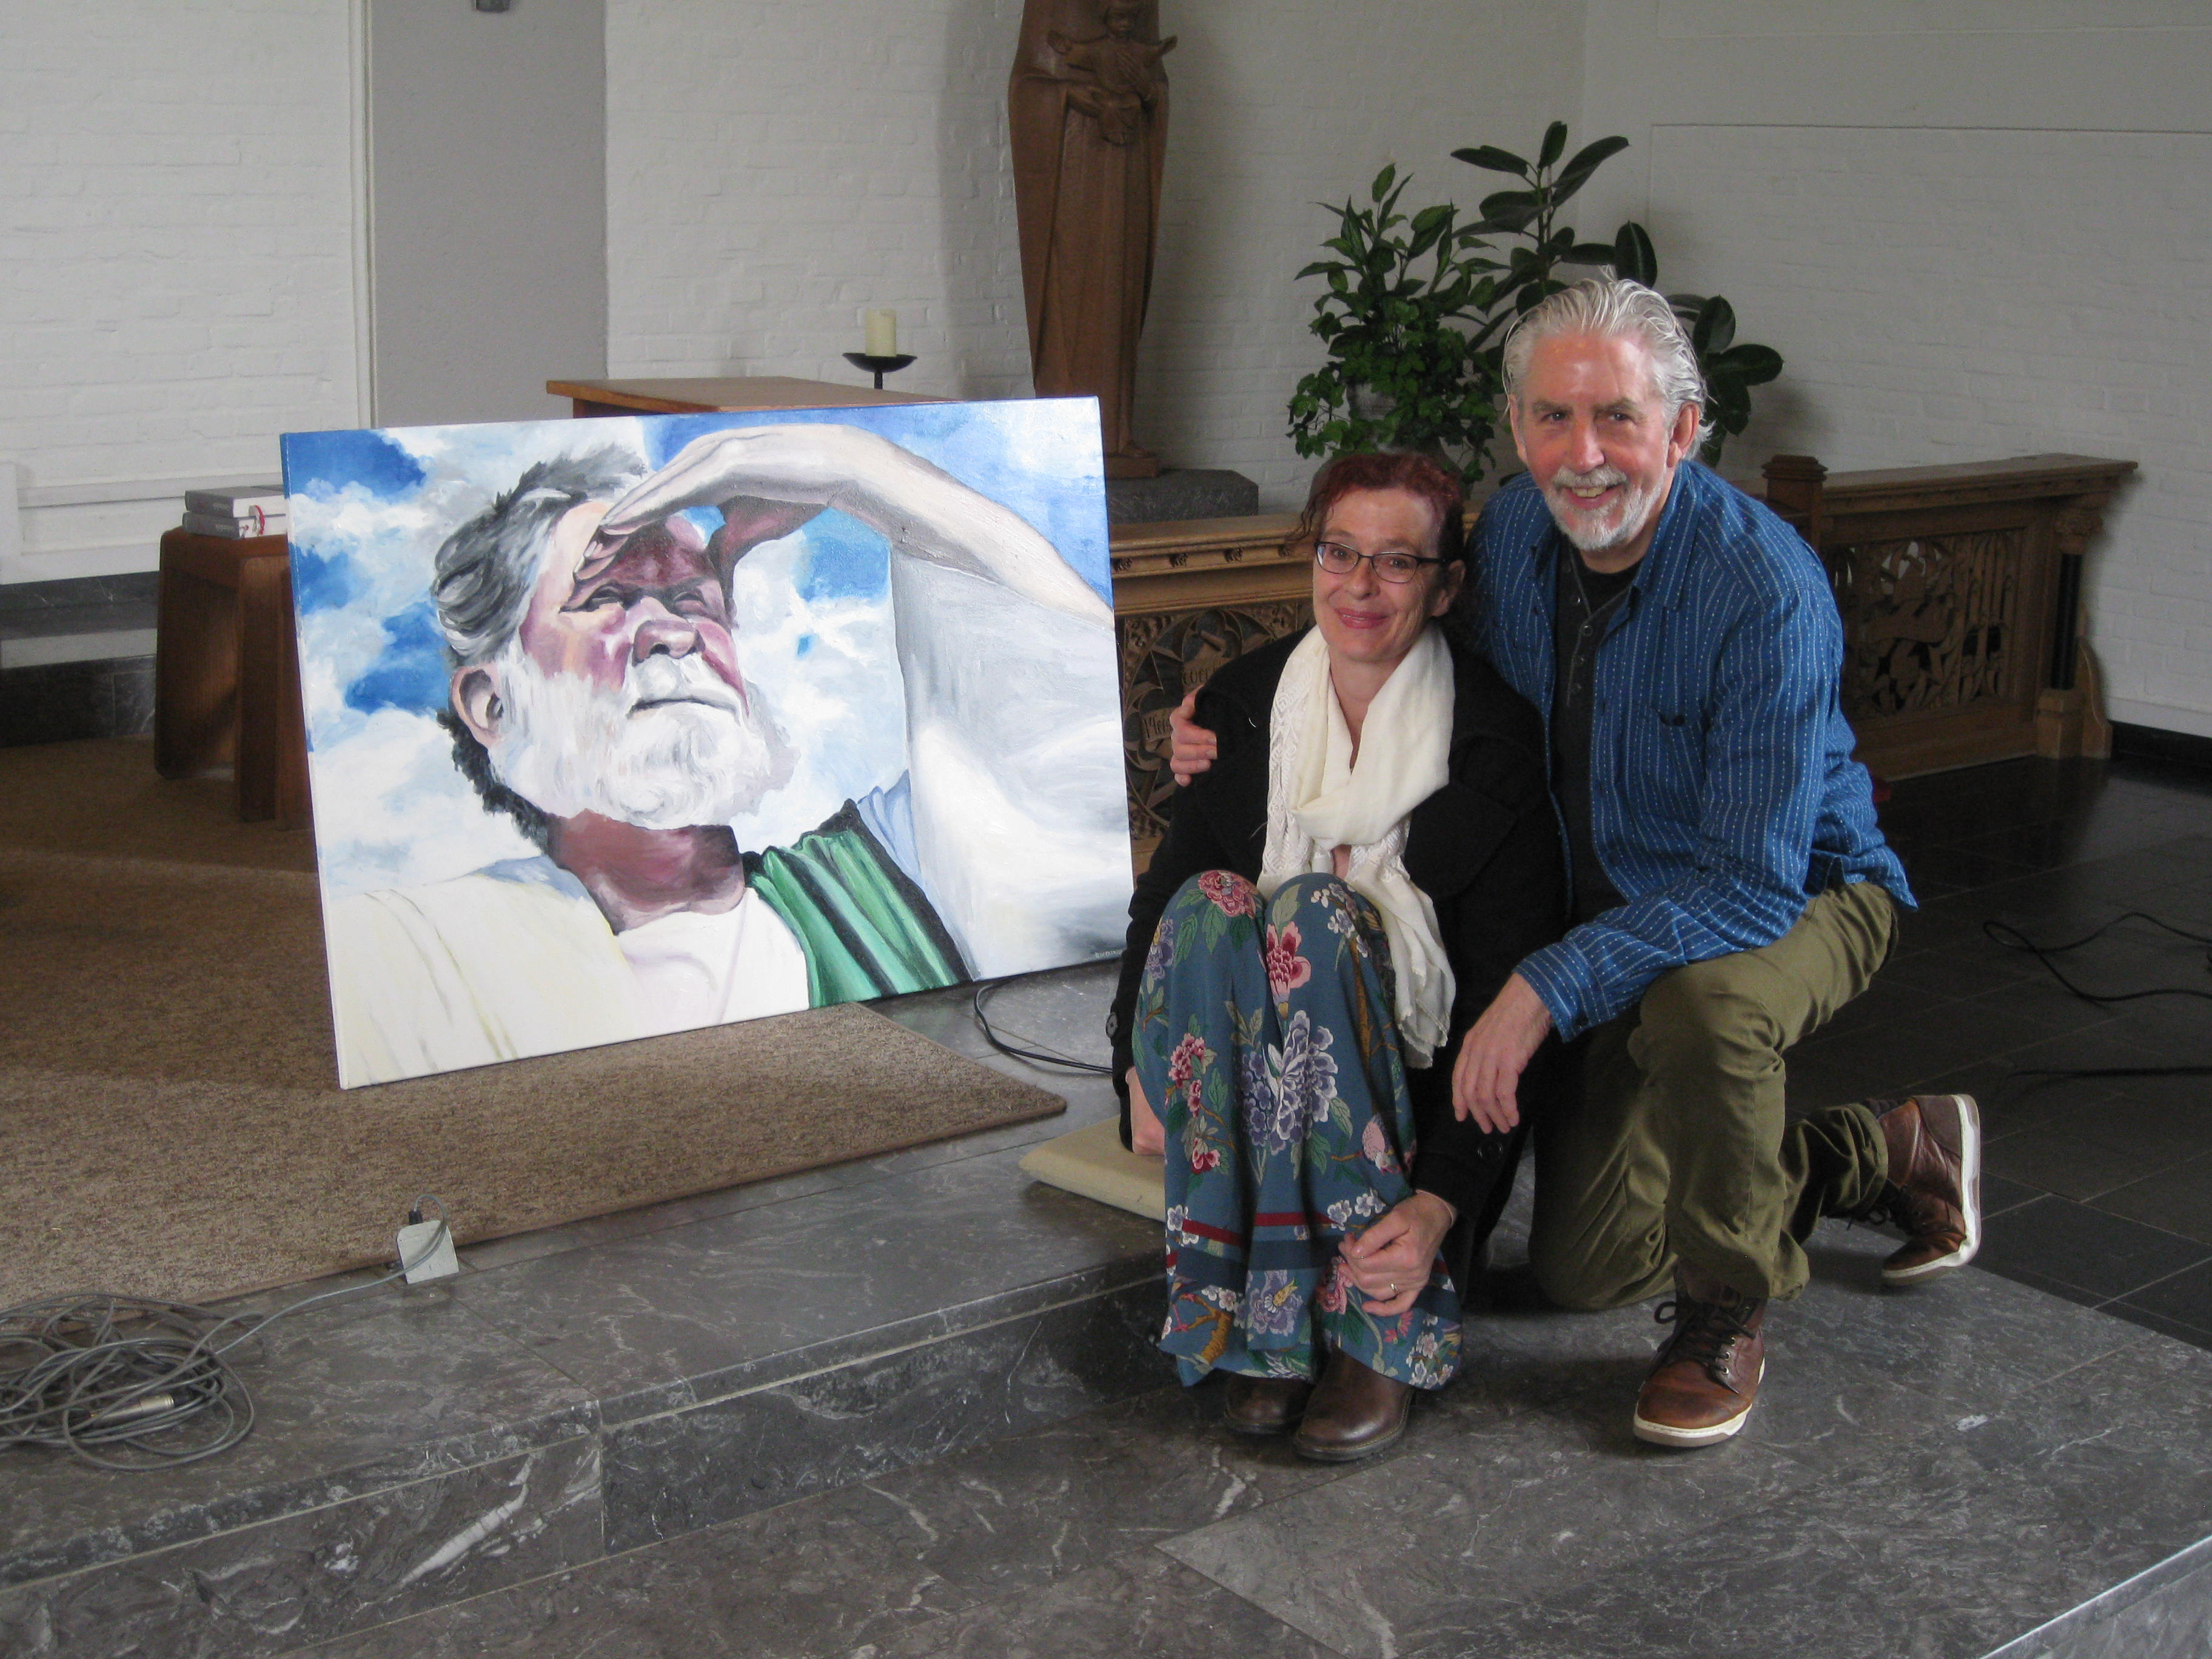 Rückblick Vaterherz Seminar, St. Hubertus in  Süsterseel, 15./ 16. März 2019